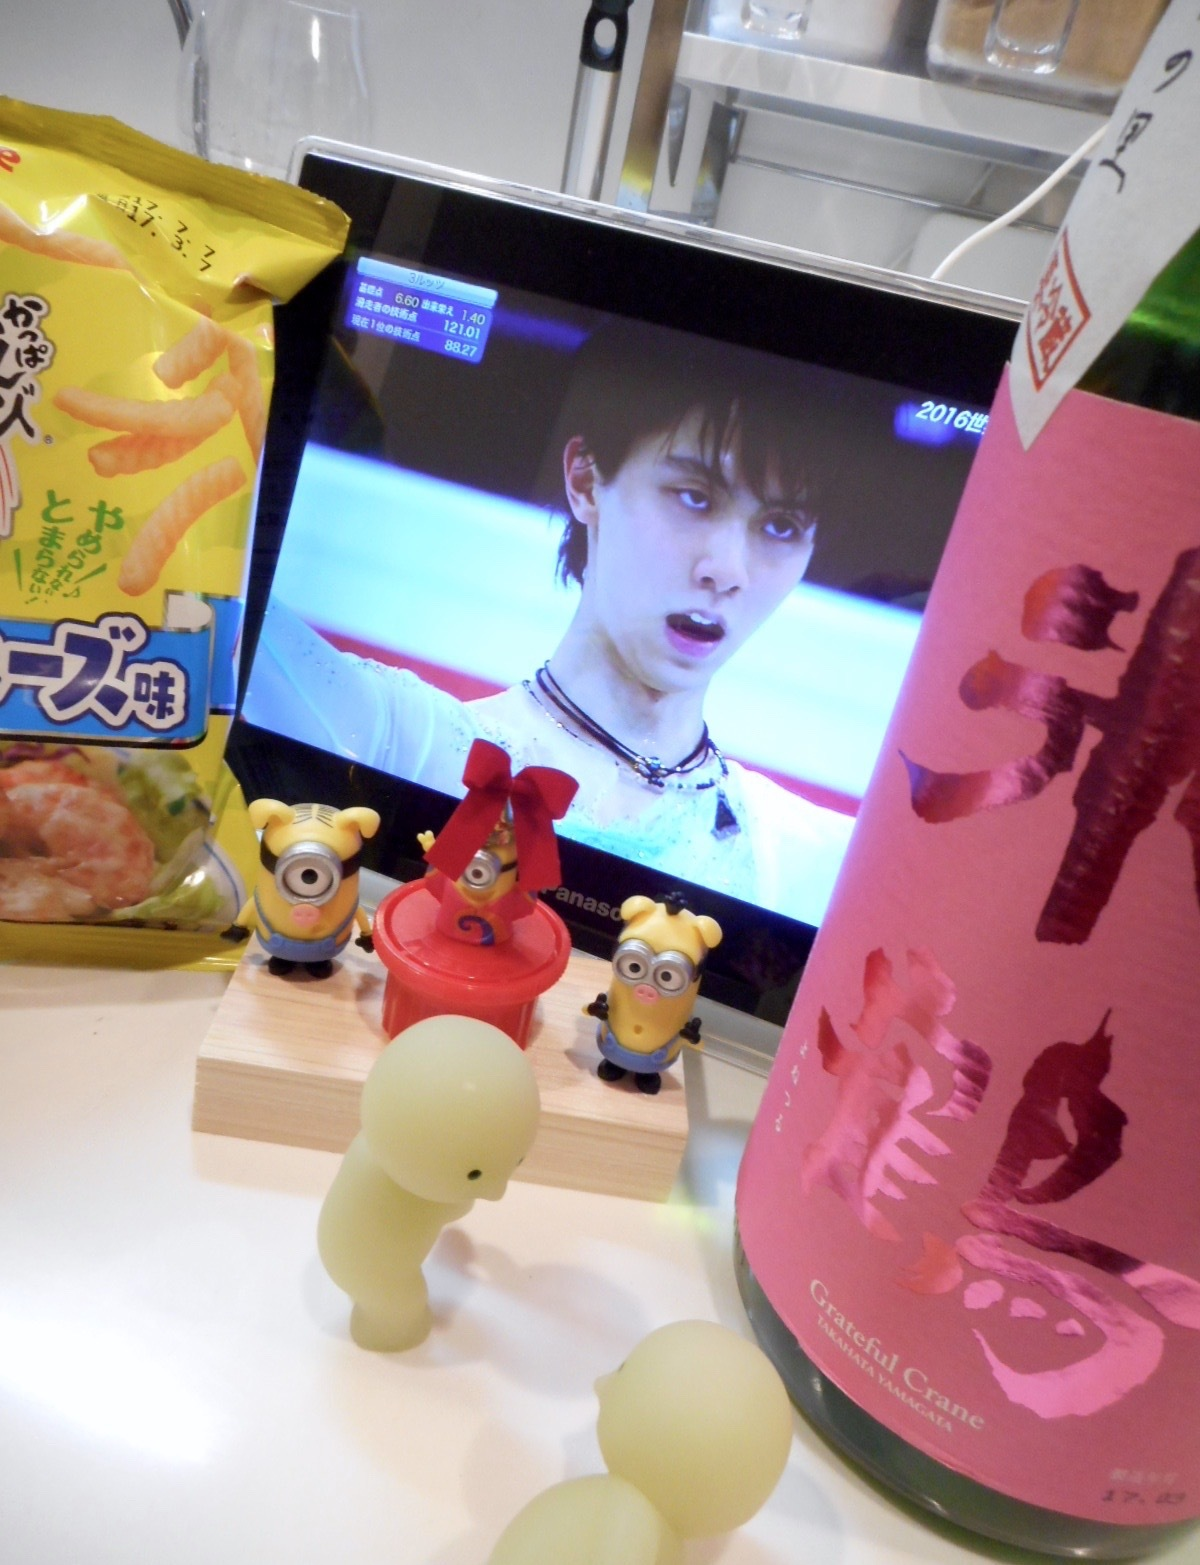 yonetsuru_jungin_shiboritate28by3.jpg